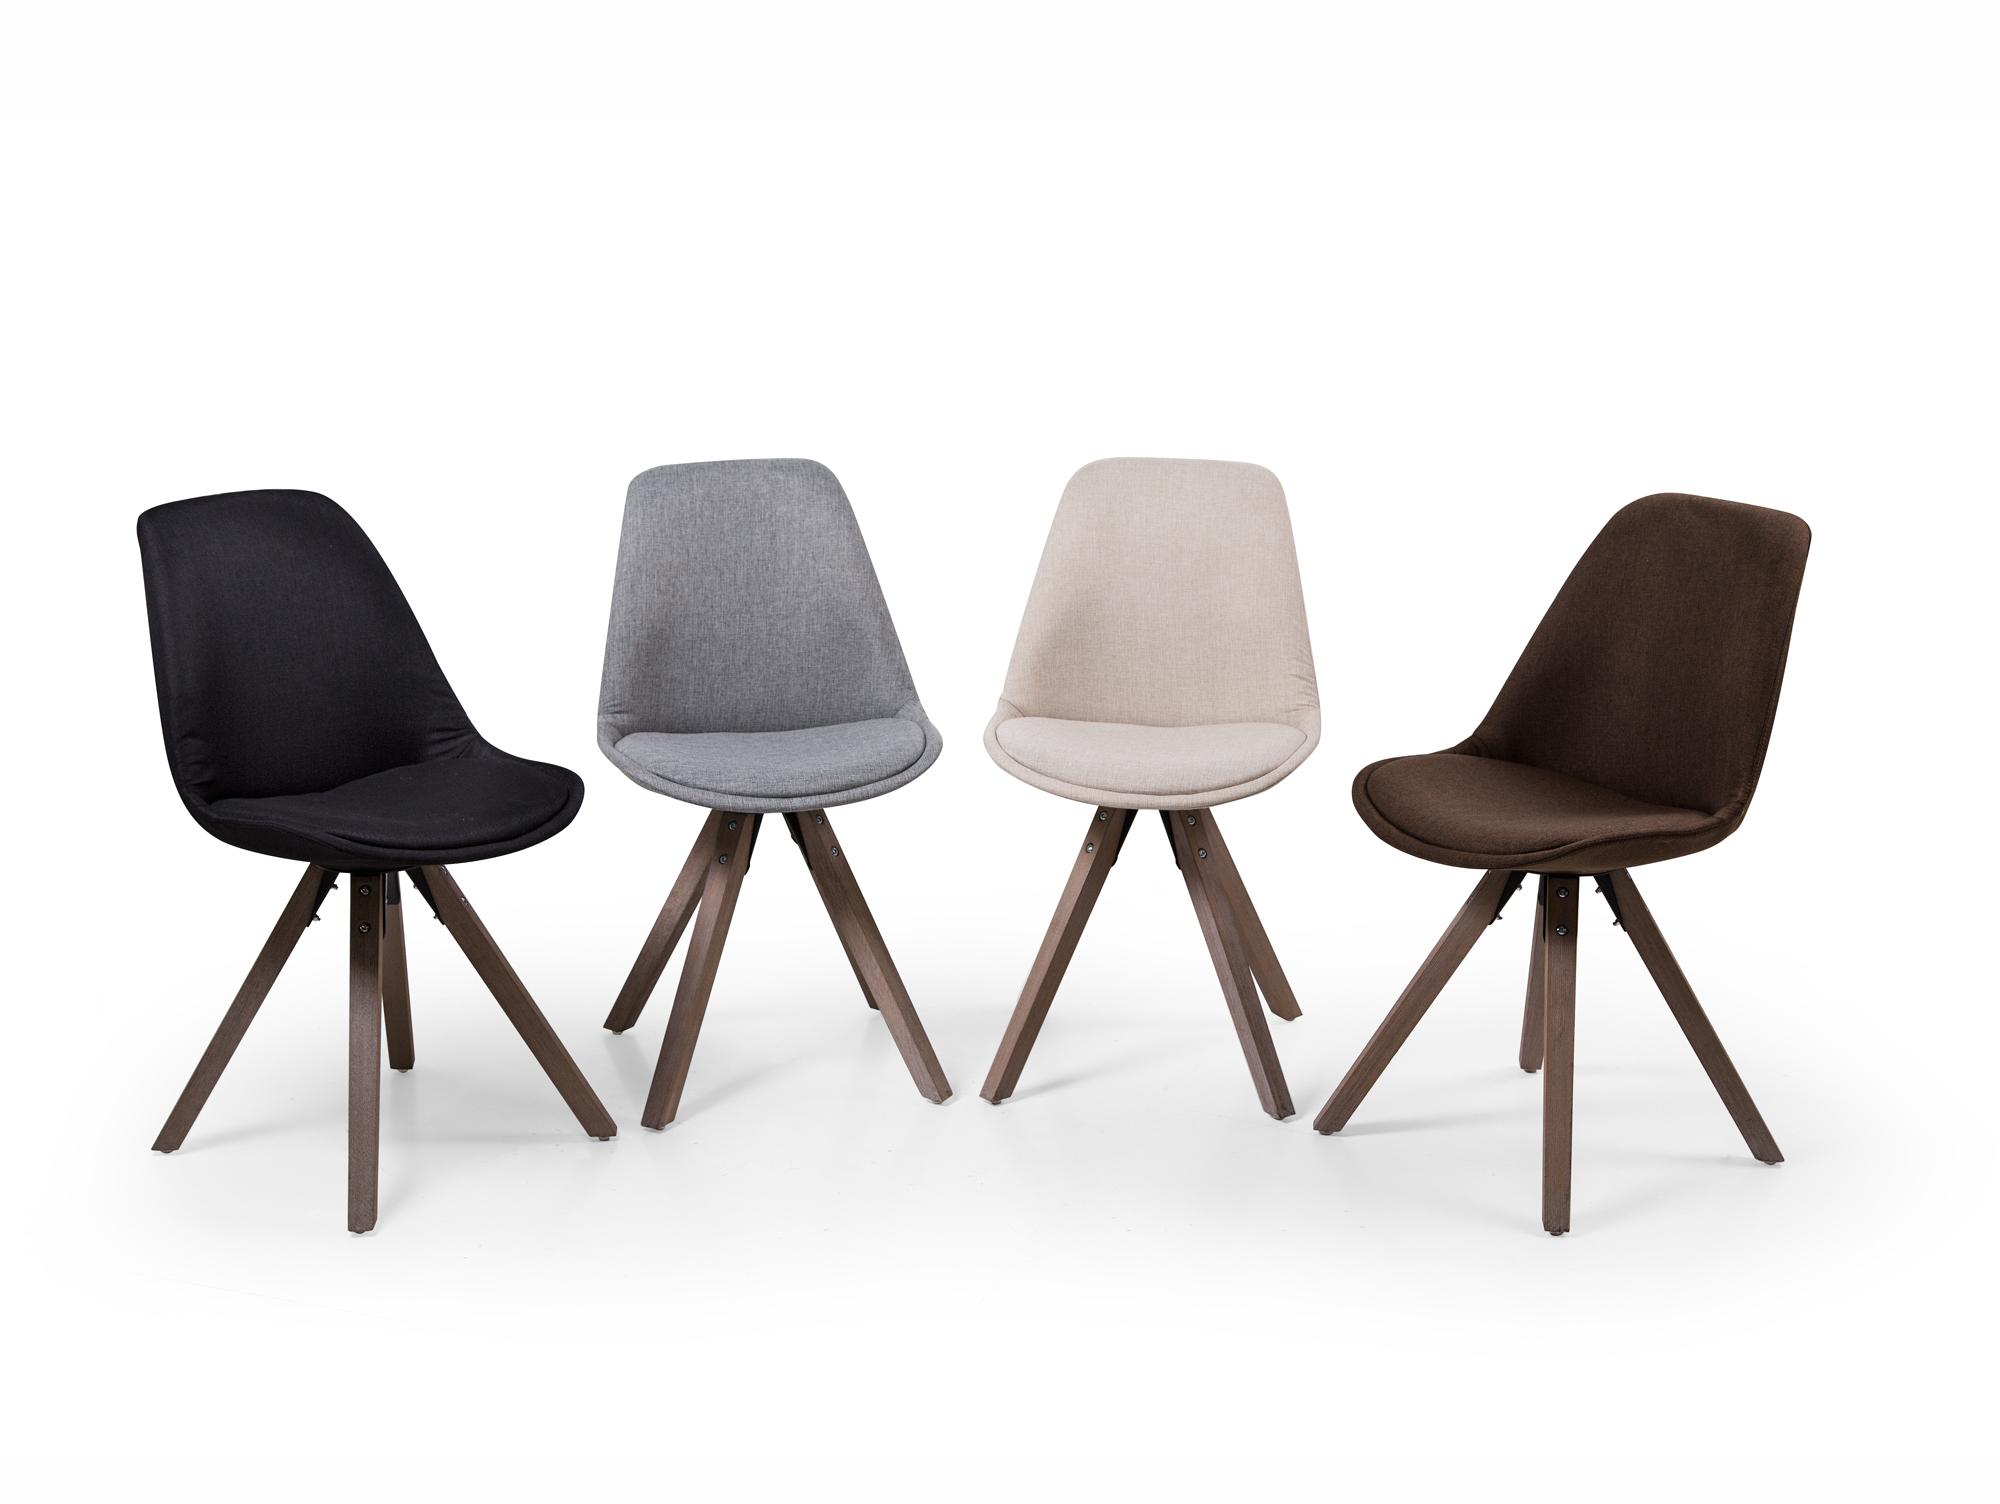 PITU Designerstuhl mit Schalensitz Stuhl Sessel Industrial